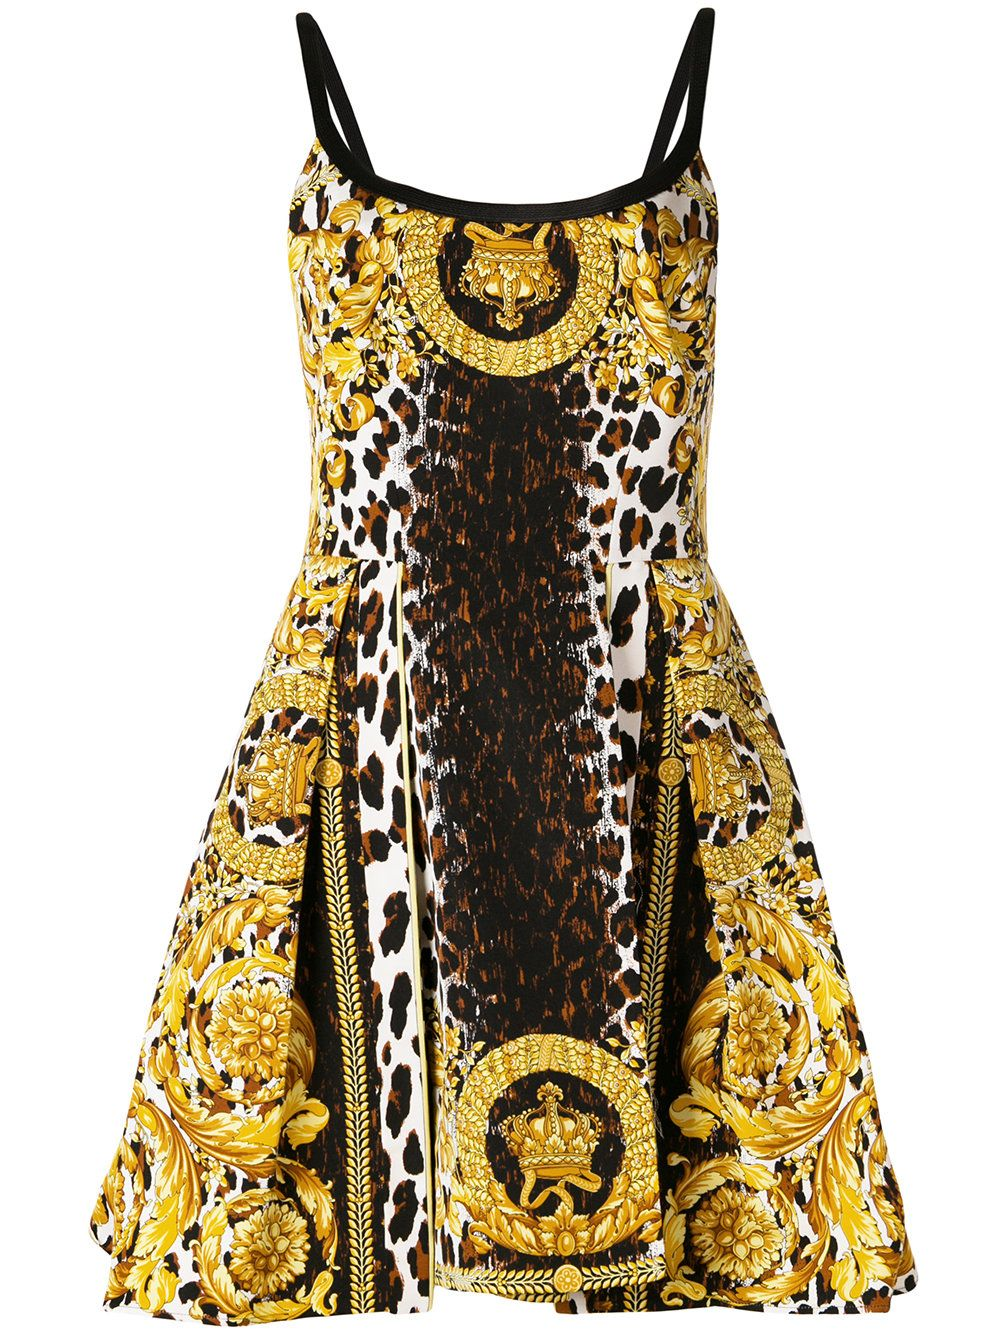 versace leopard and baroque print mini dress | reiseziele in